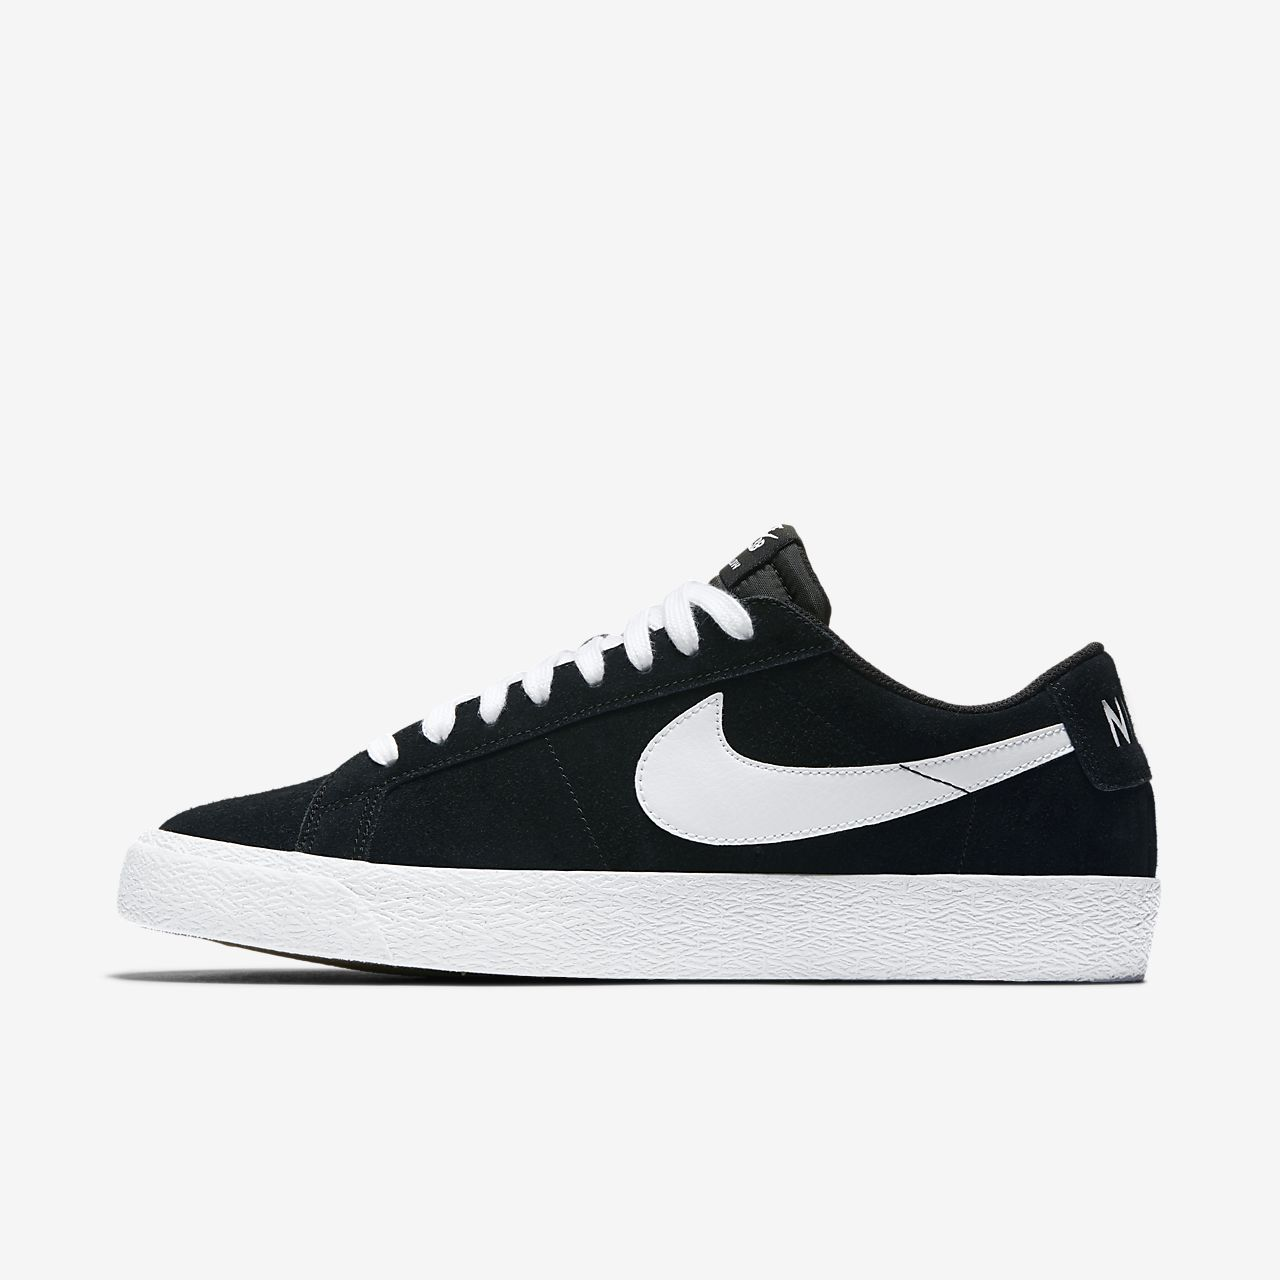 cheap for discount 74f3d 97d8d ... Nike SB Blazer Zoom Low Zapatillas de skateboard - Hombre